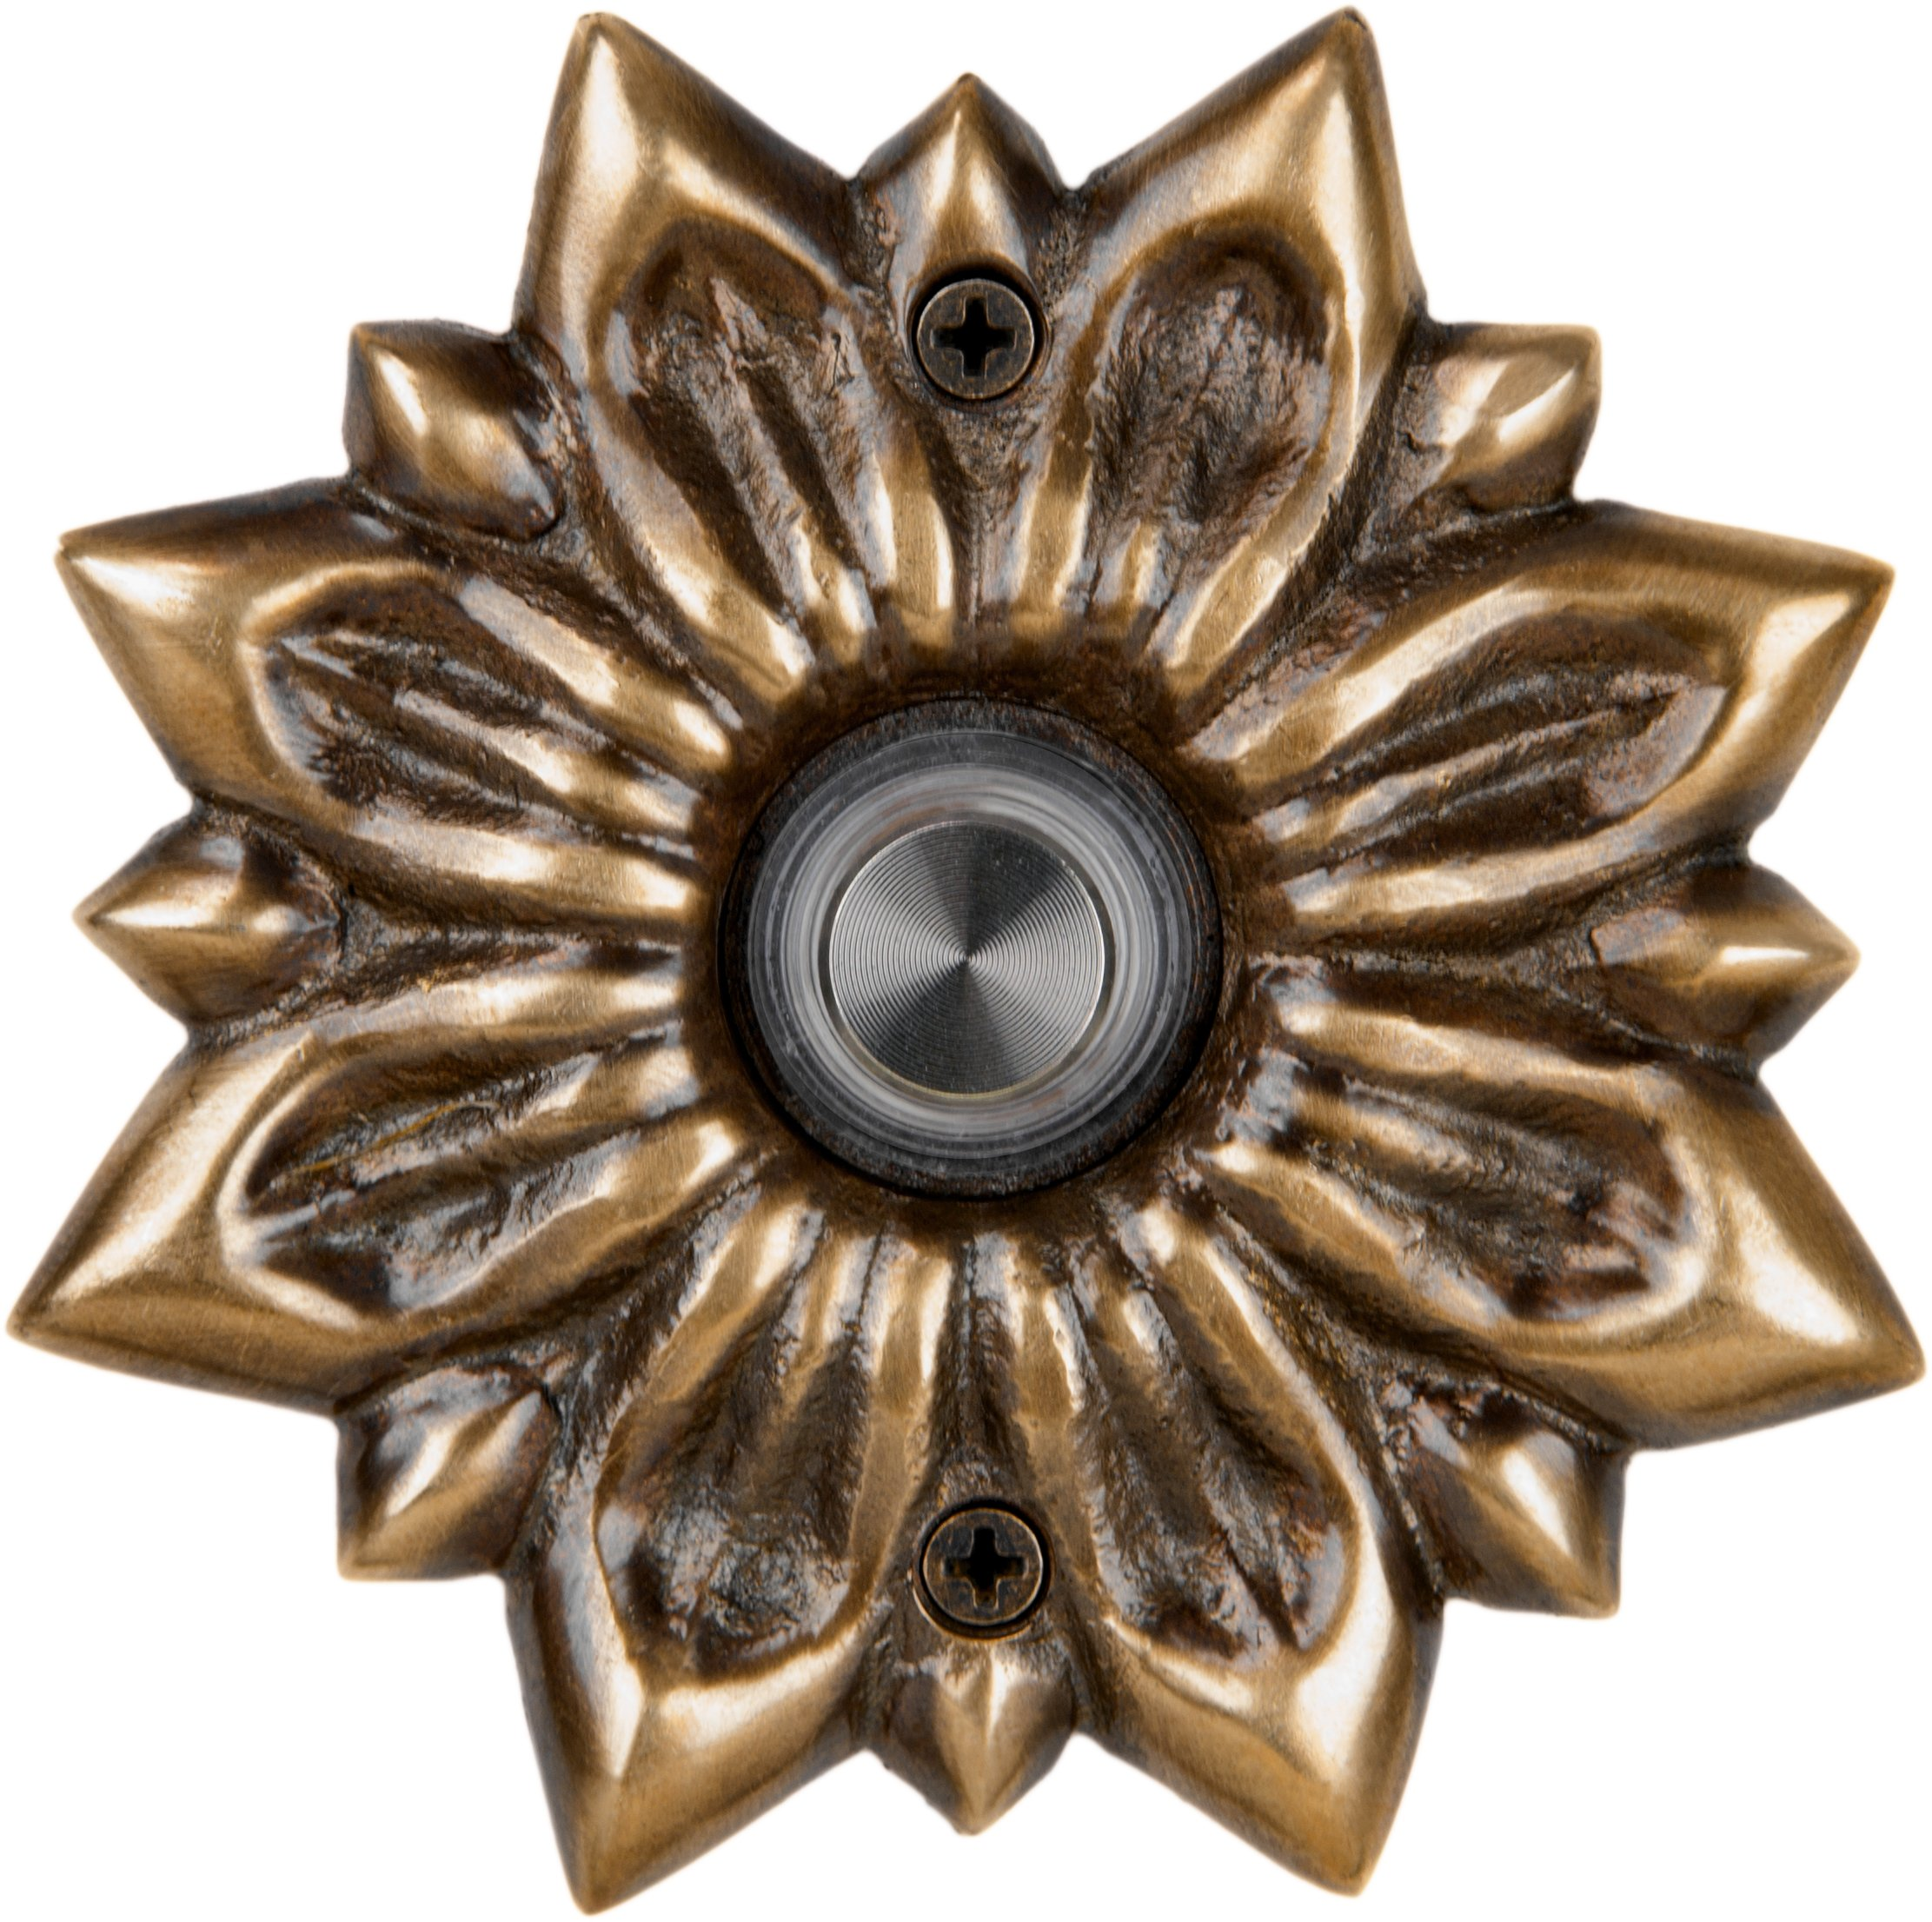 Waterwood Solid Brass Radiance Doorbell in Antique Brass